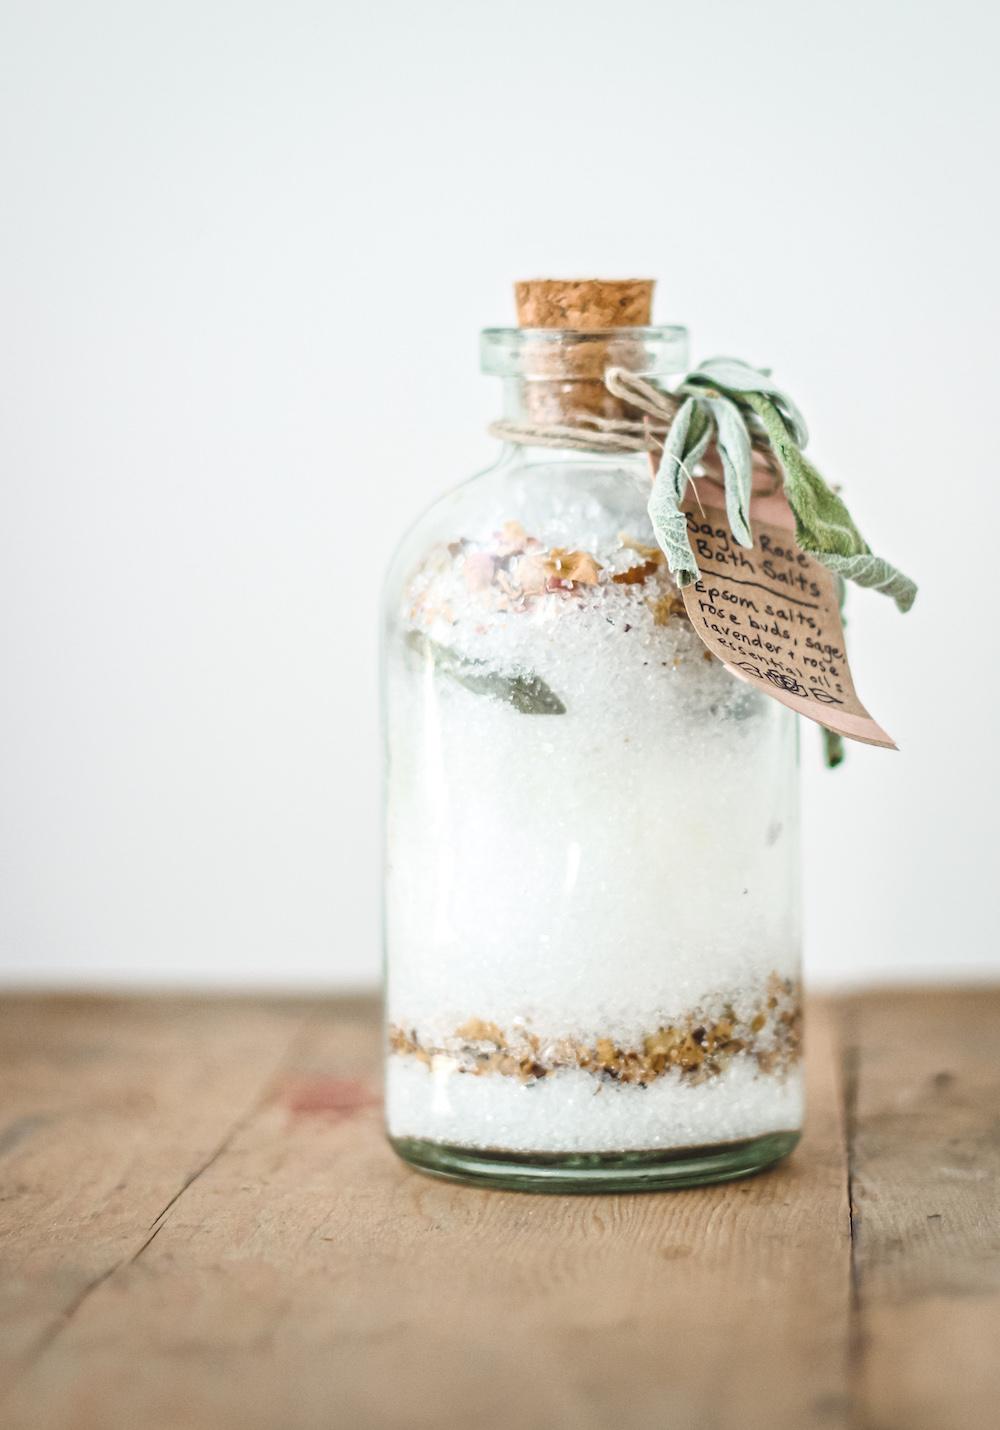 salt bath soak in glass jar